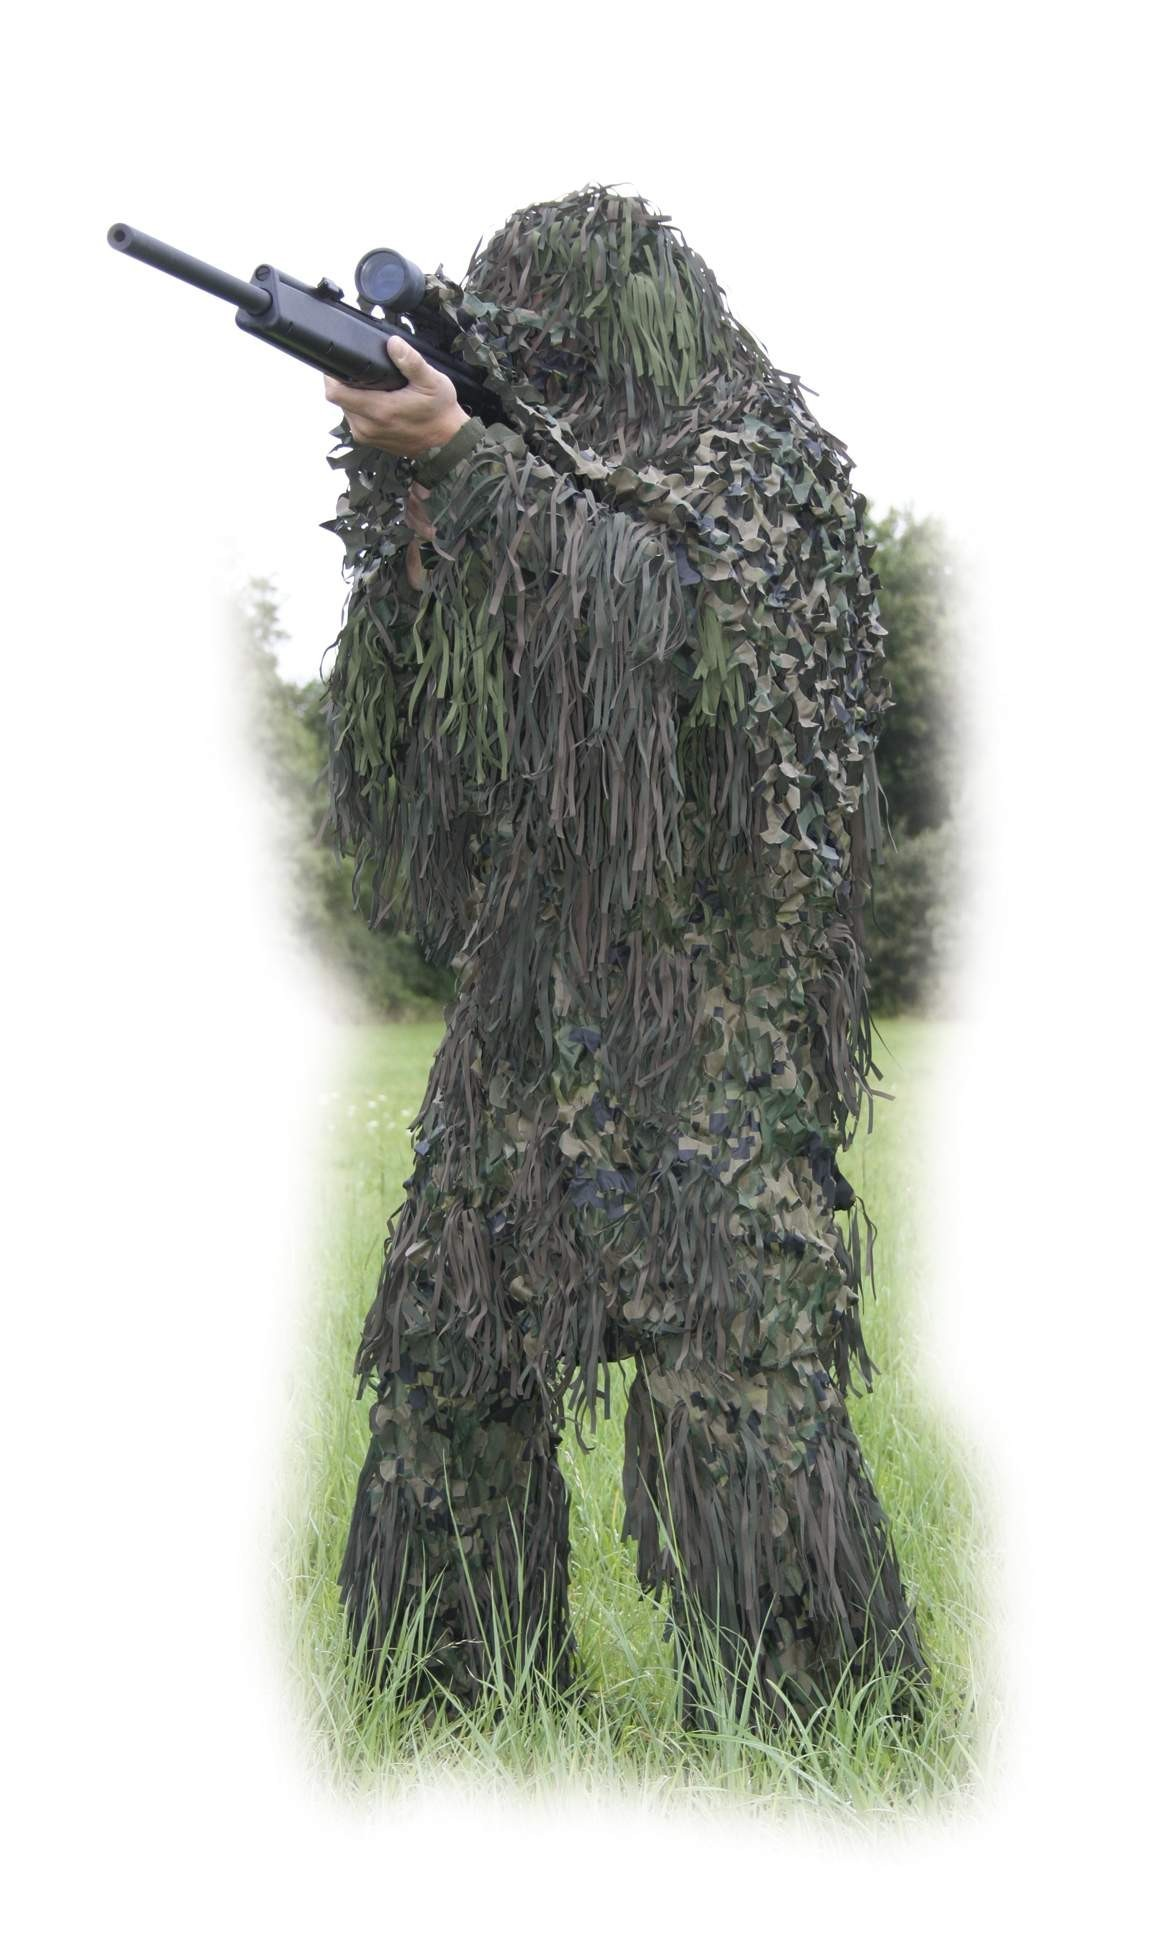 tenue compl te de camouflage ghili m l abris et filets de camouflage made in chasse. Black Bedroom Furniture Sets. Home Design Ideas